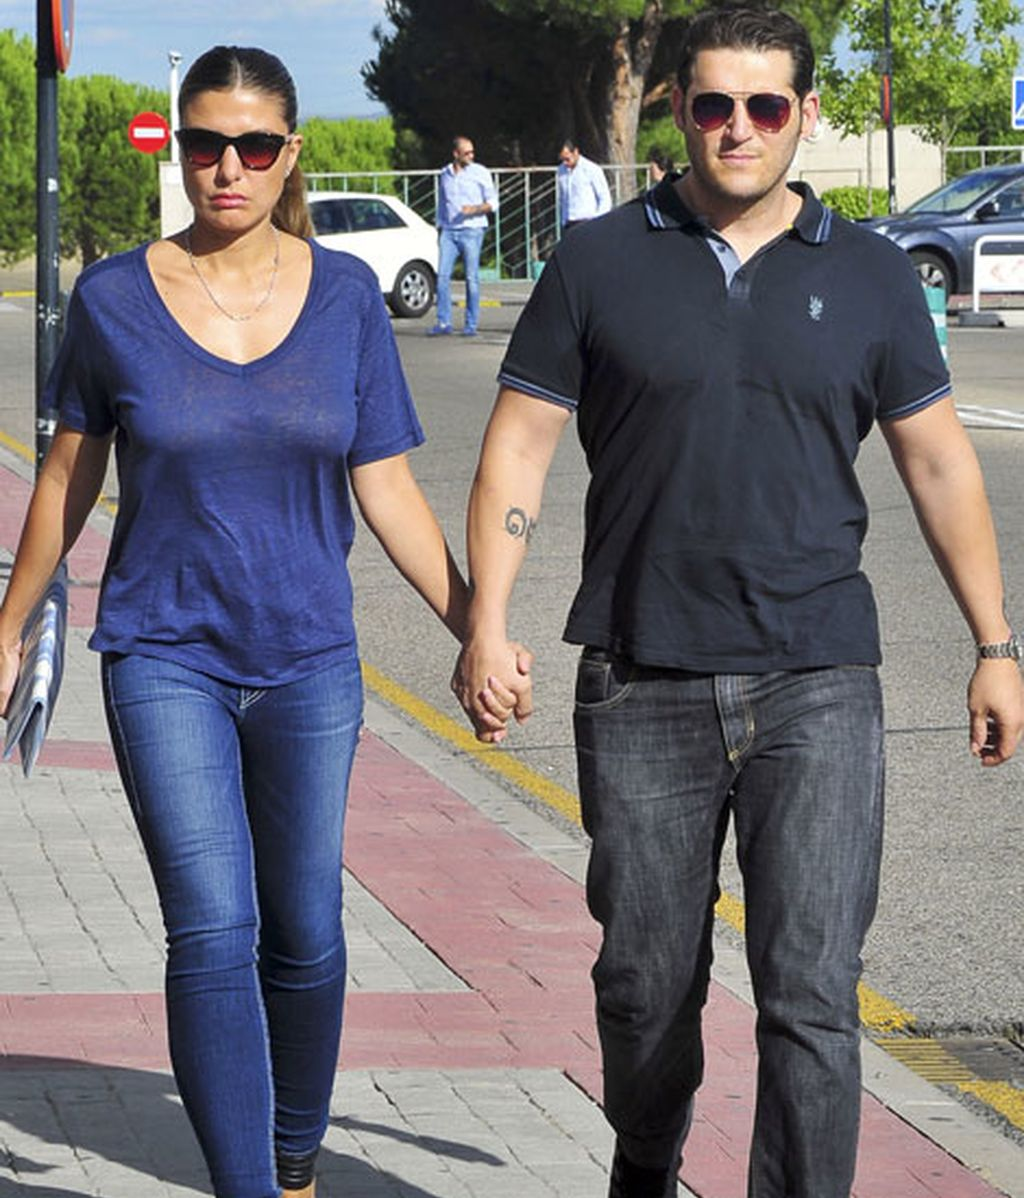 Manu Tenorio y su mujer Silvia Casas